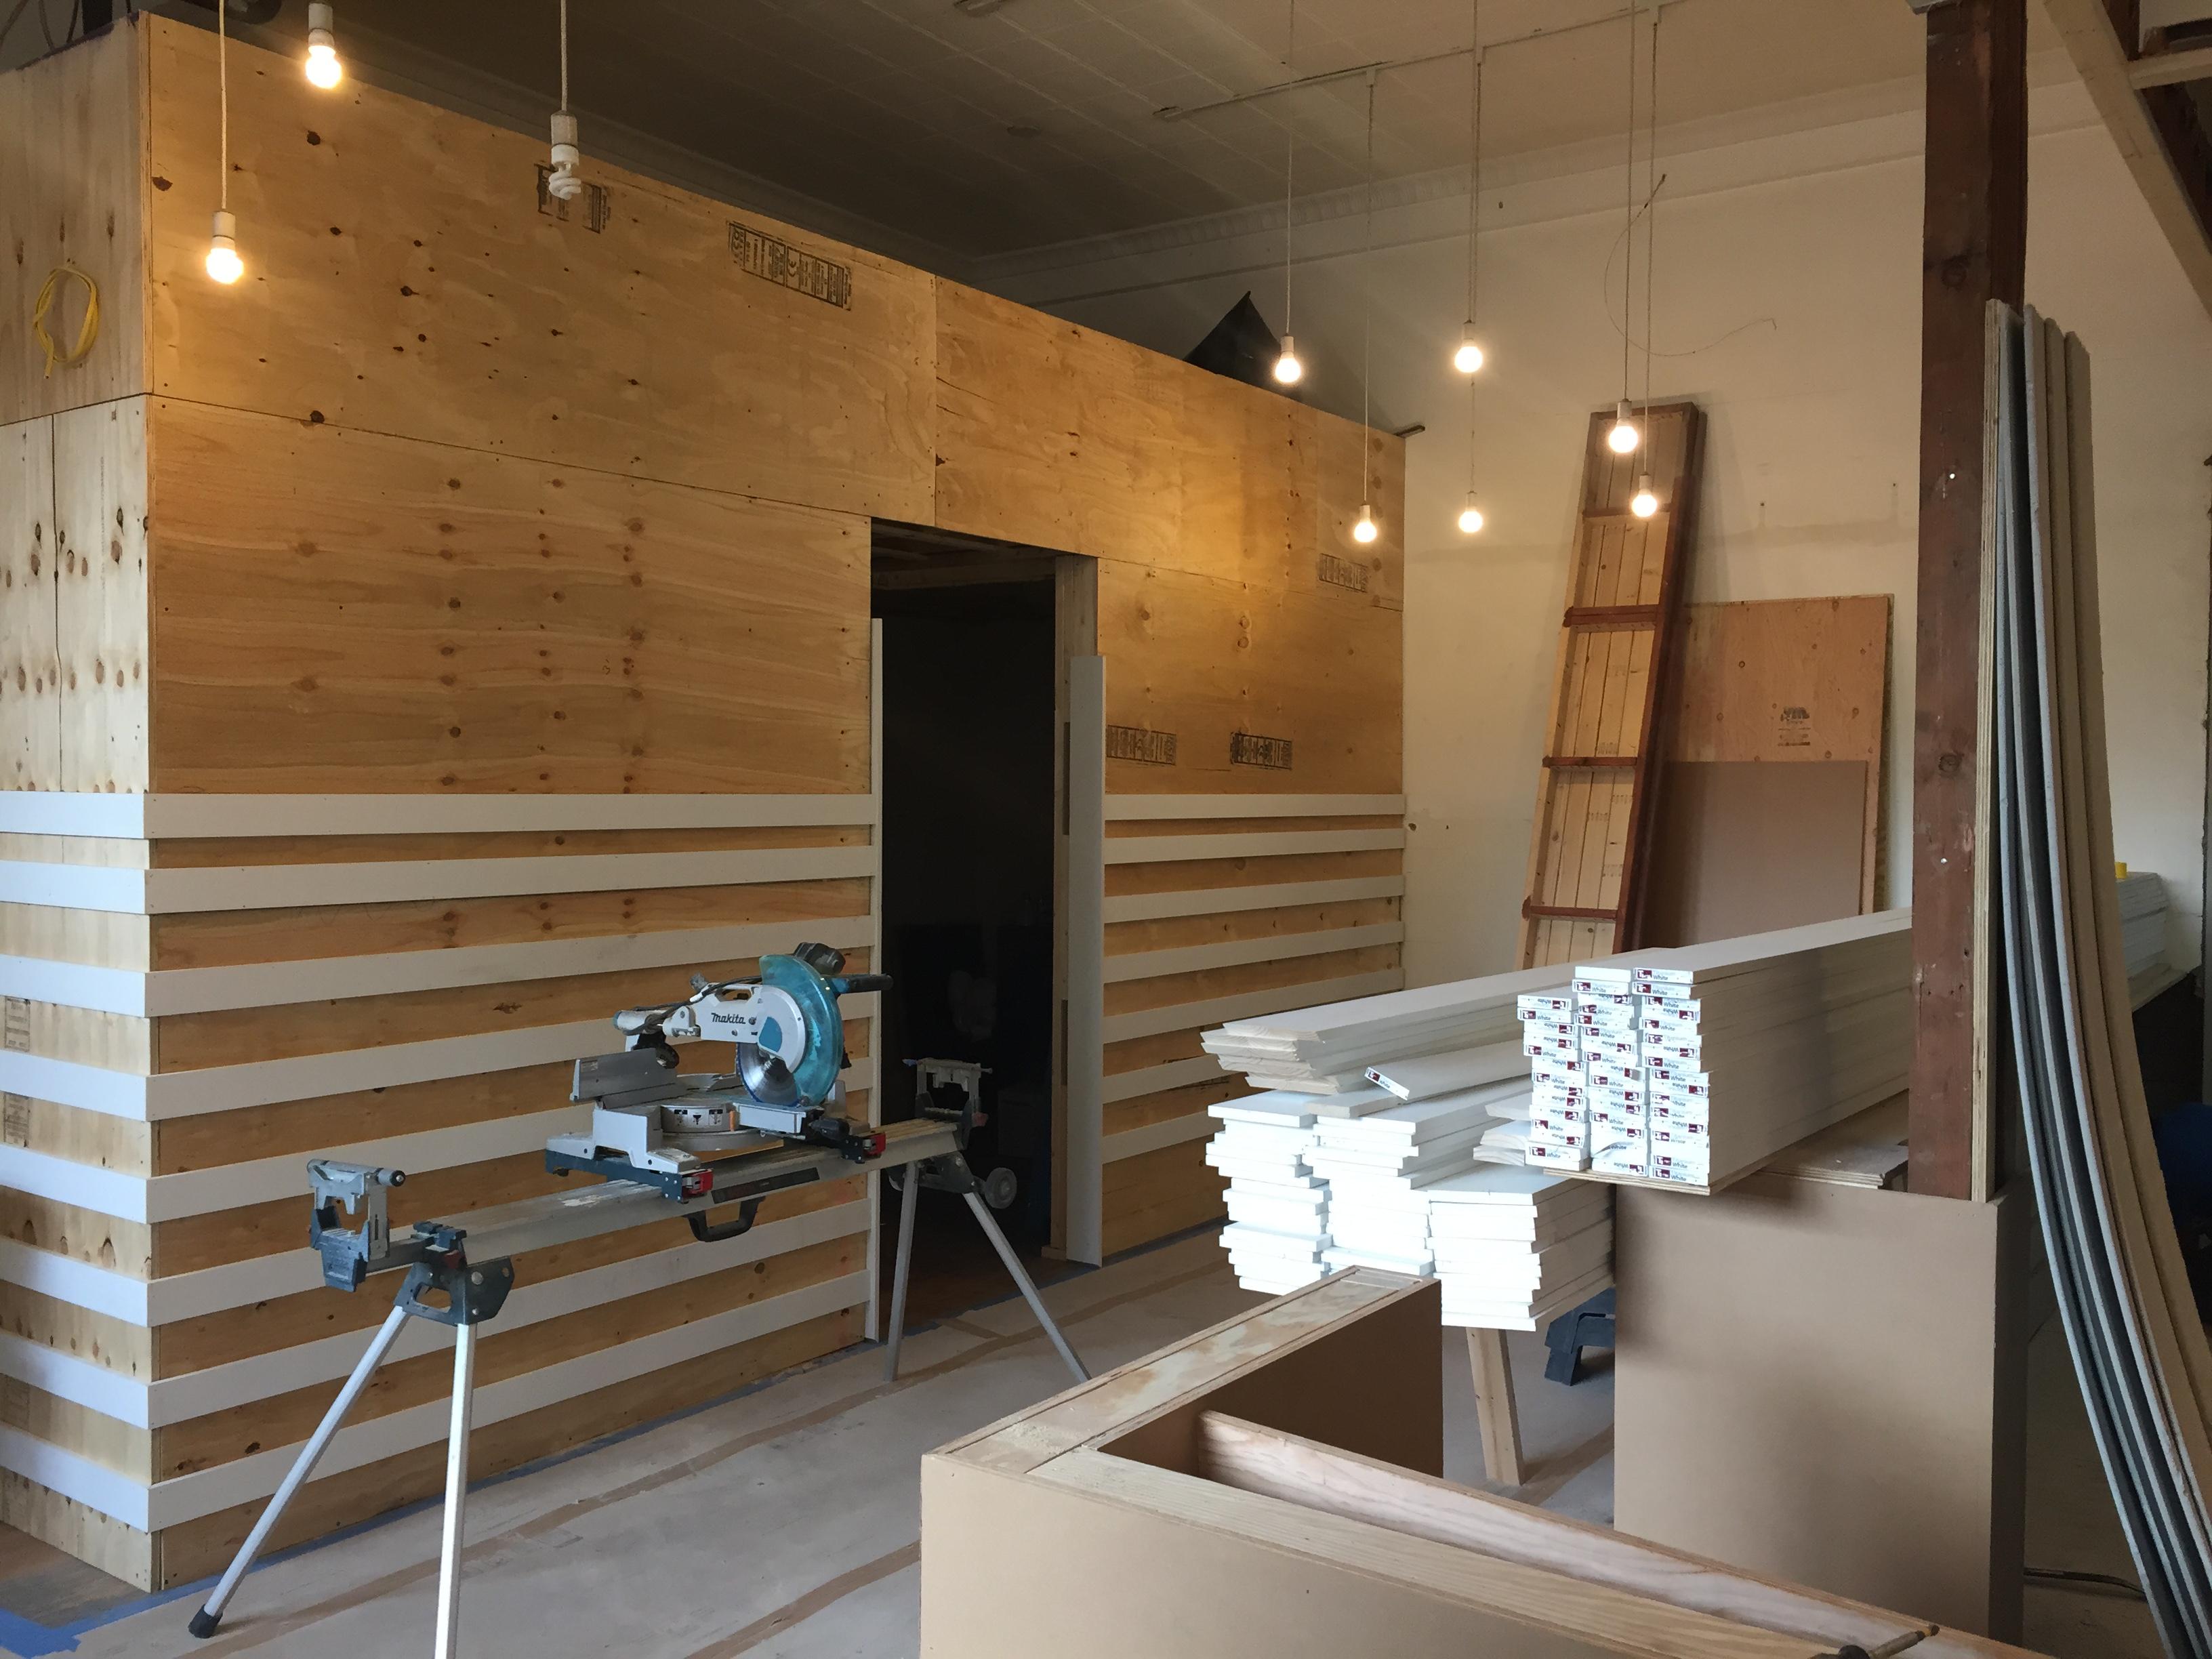 Construction is well underway at Juliet.